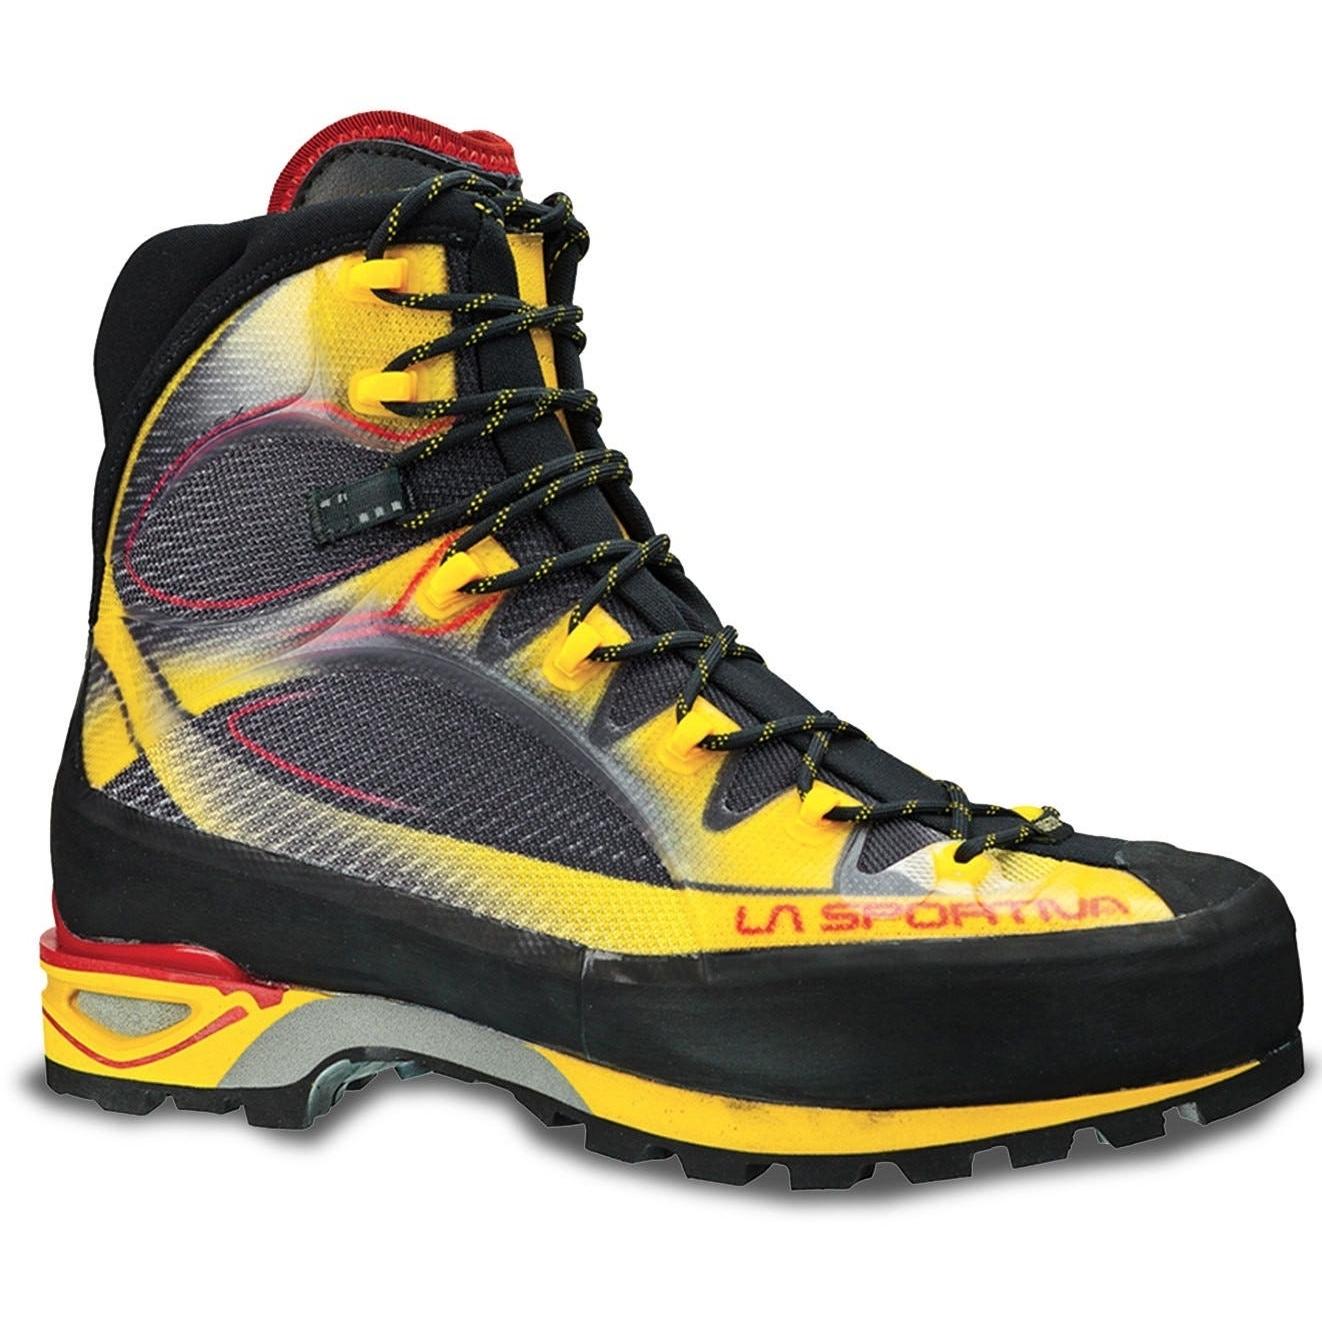 Image of La Sportiva Trango Cube GTX Mountaineering Shoes - Yellow/Black